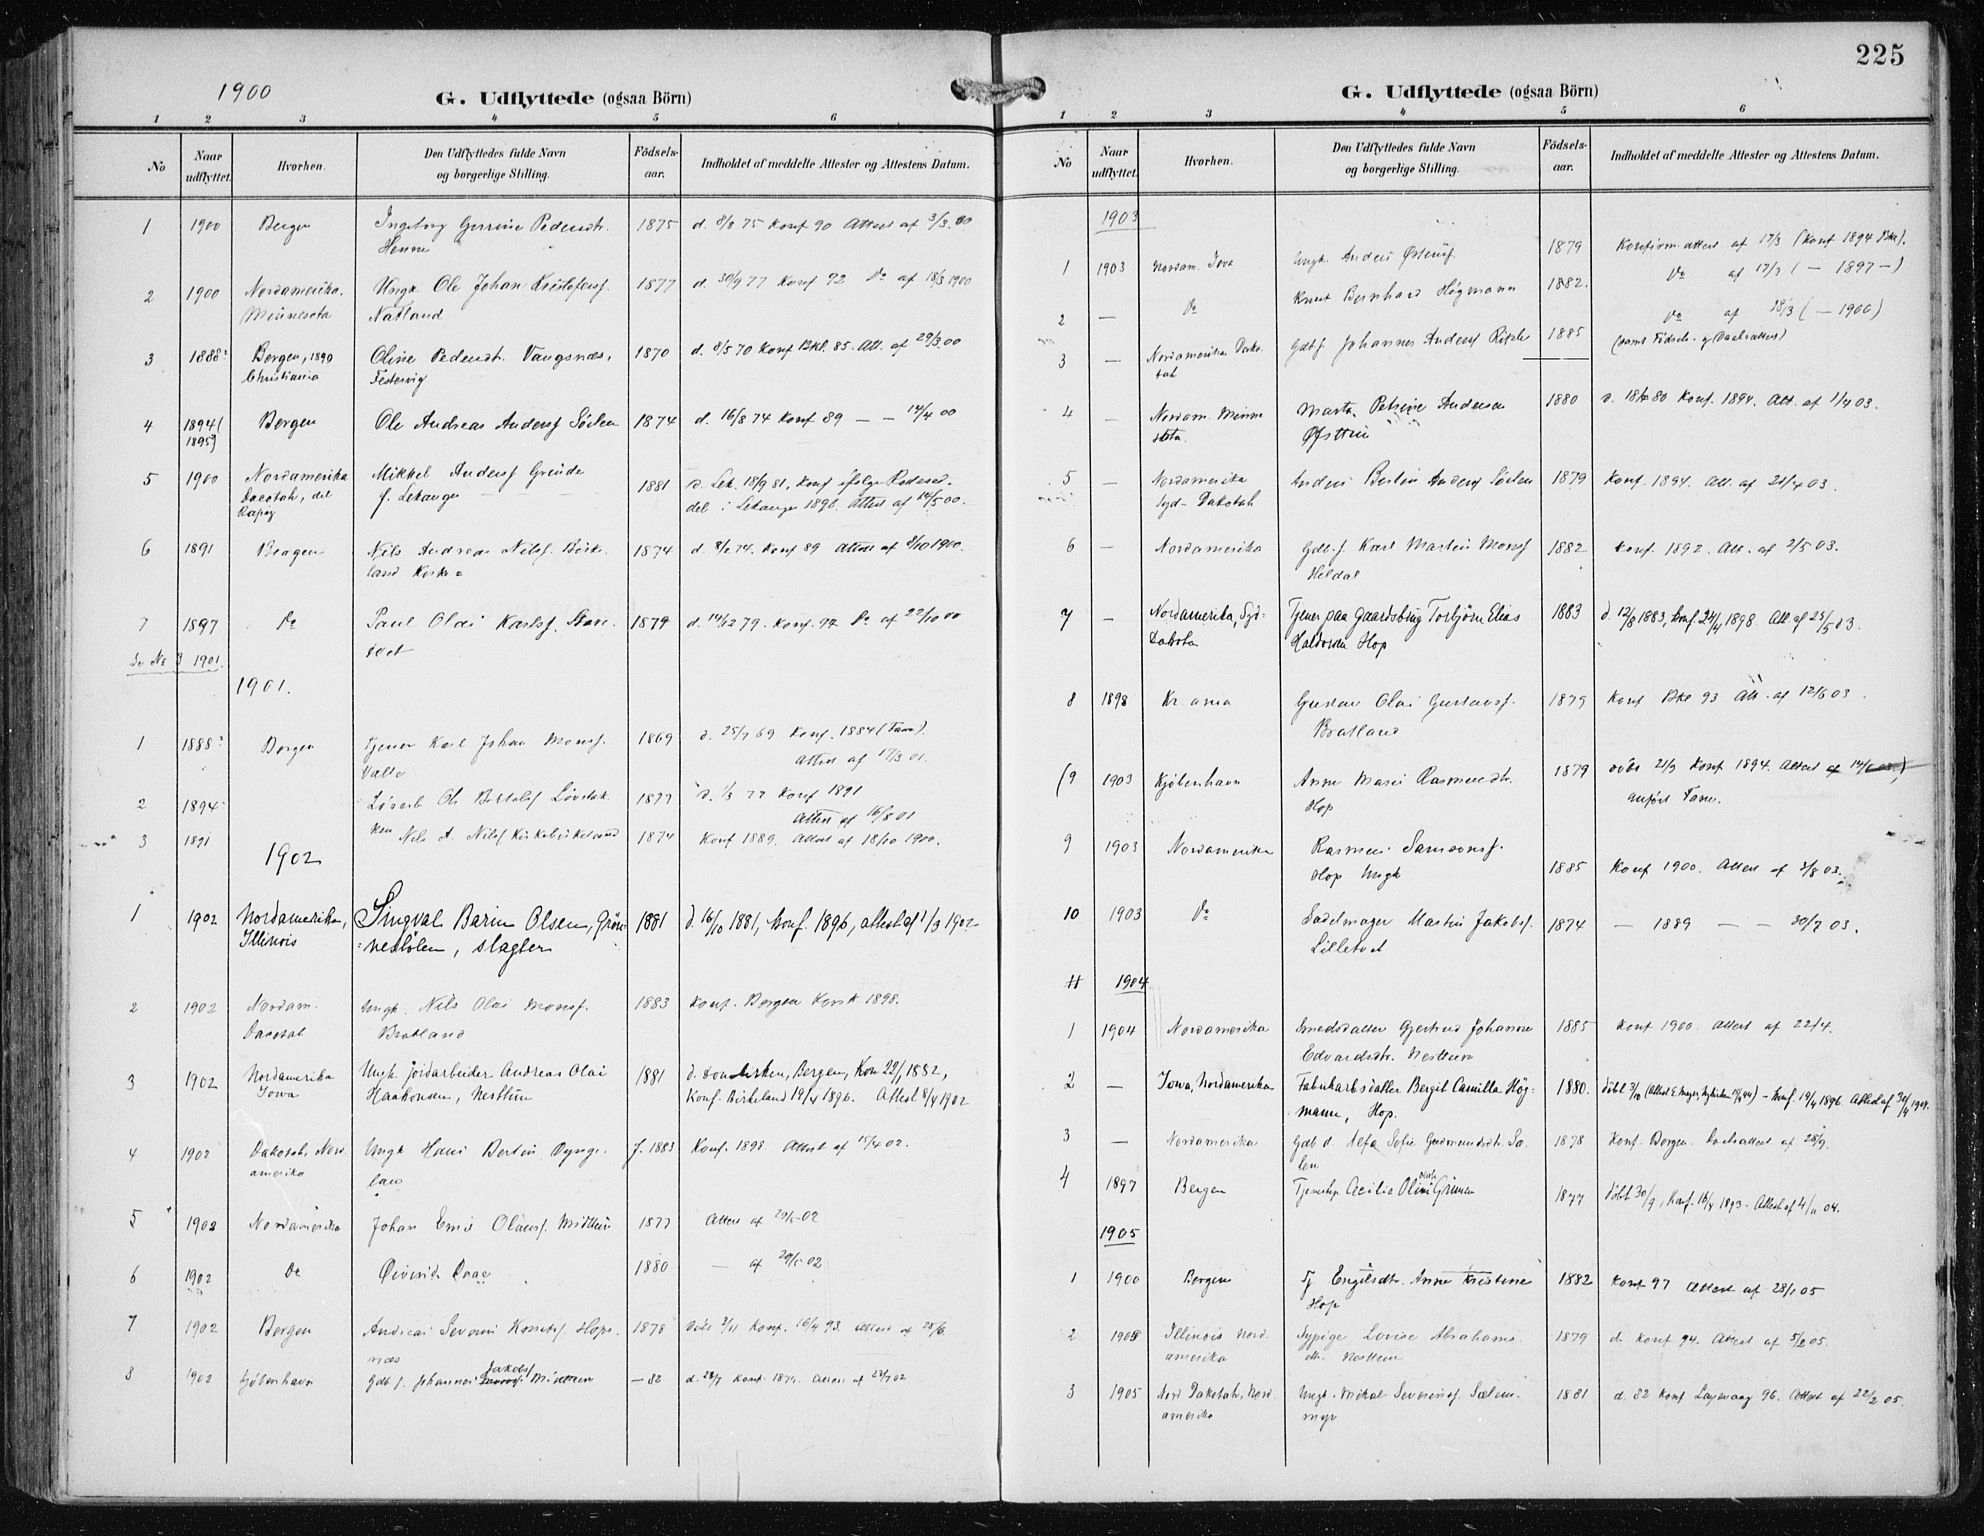 SAB, Fana Sokneprestembete, H/Haa/Haai/L0003: Ministerialbok nr. I 3, 1900-1912, s. 225